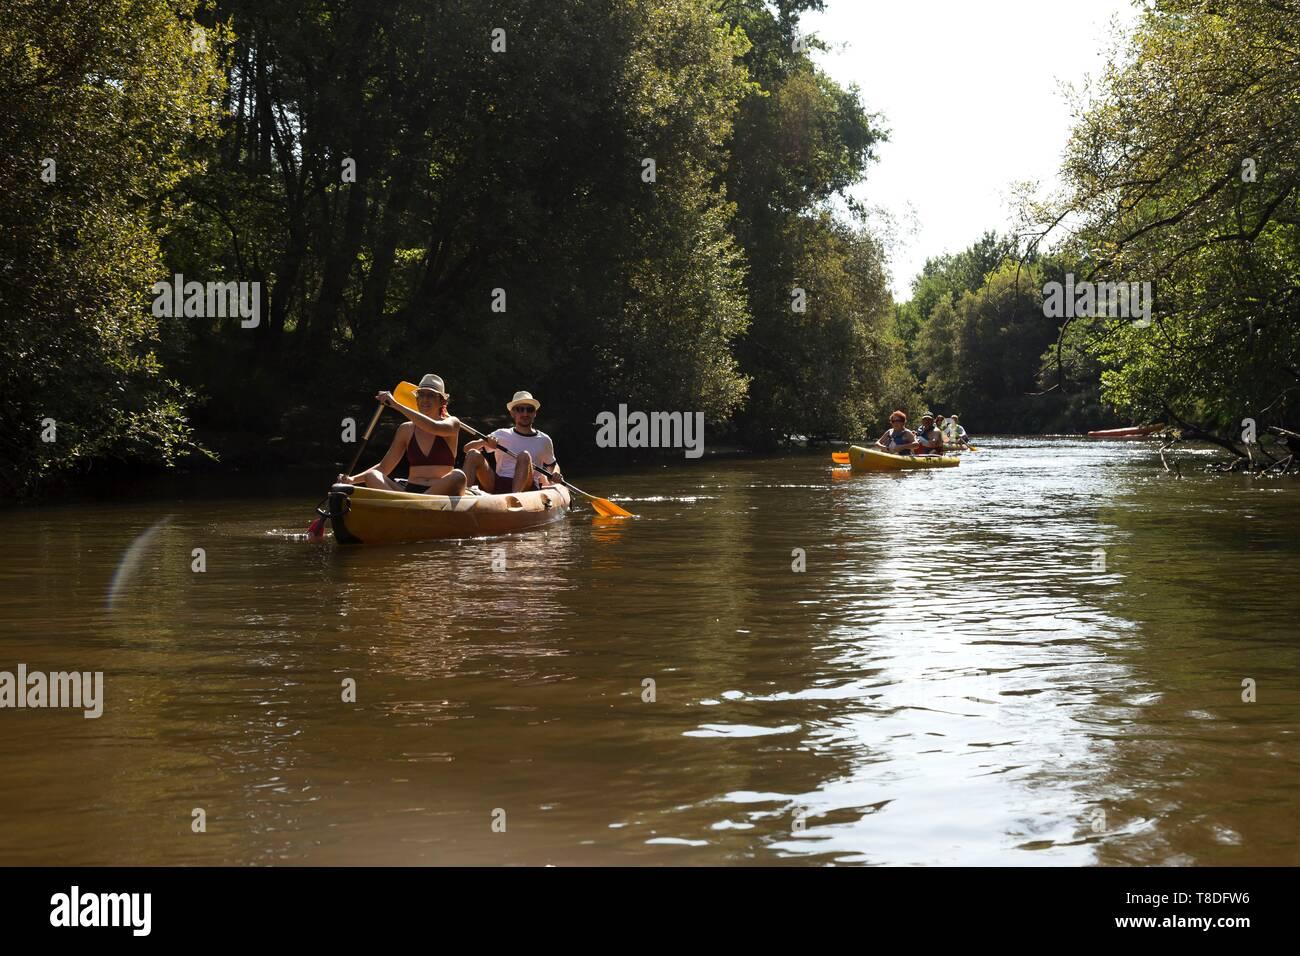 Francia, Gironde, Val de L'Eyre, Parc Naturel RÚgional des Landes de Gascogne, Salles, Leyre, sul fiume in canoa sul fiume Immagini Stock